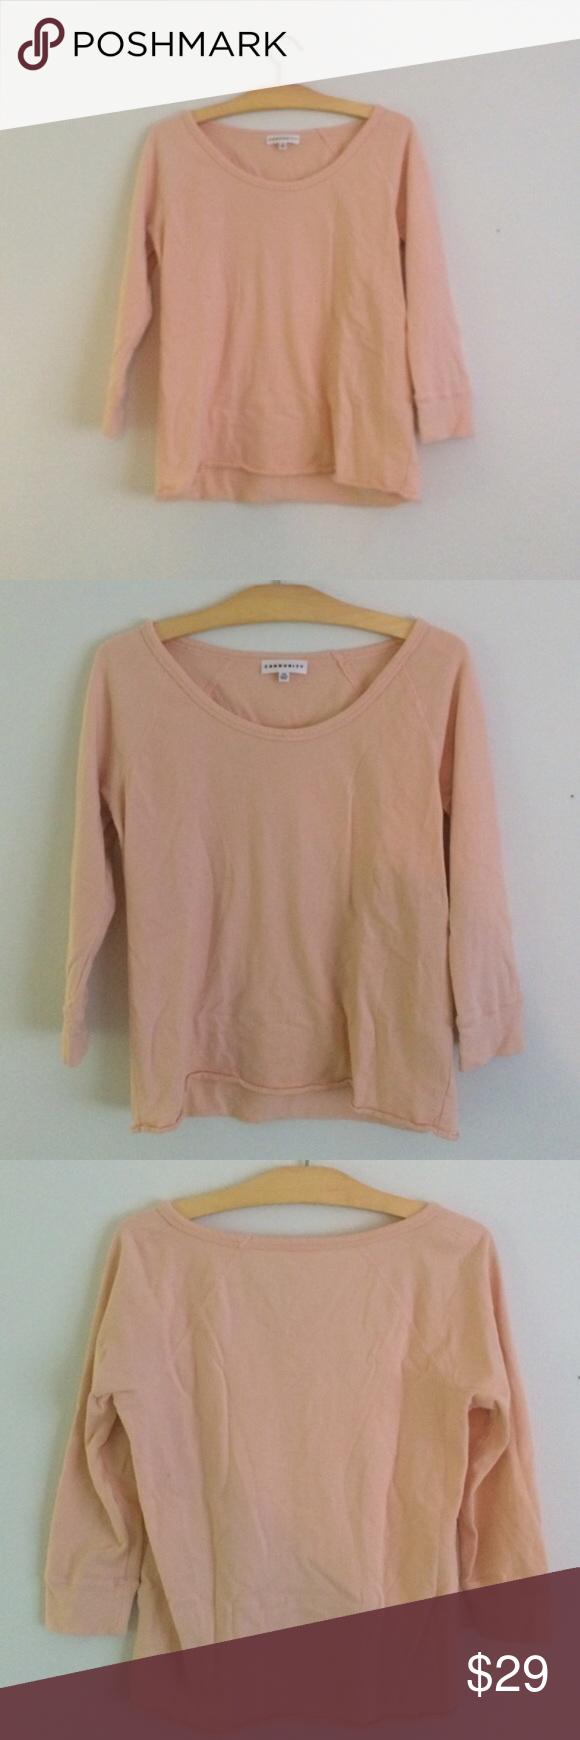 Aritzia light pink Community light sweater Very light pink, almost ...